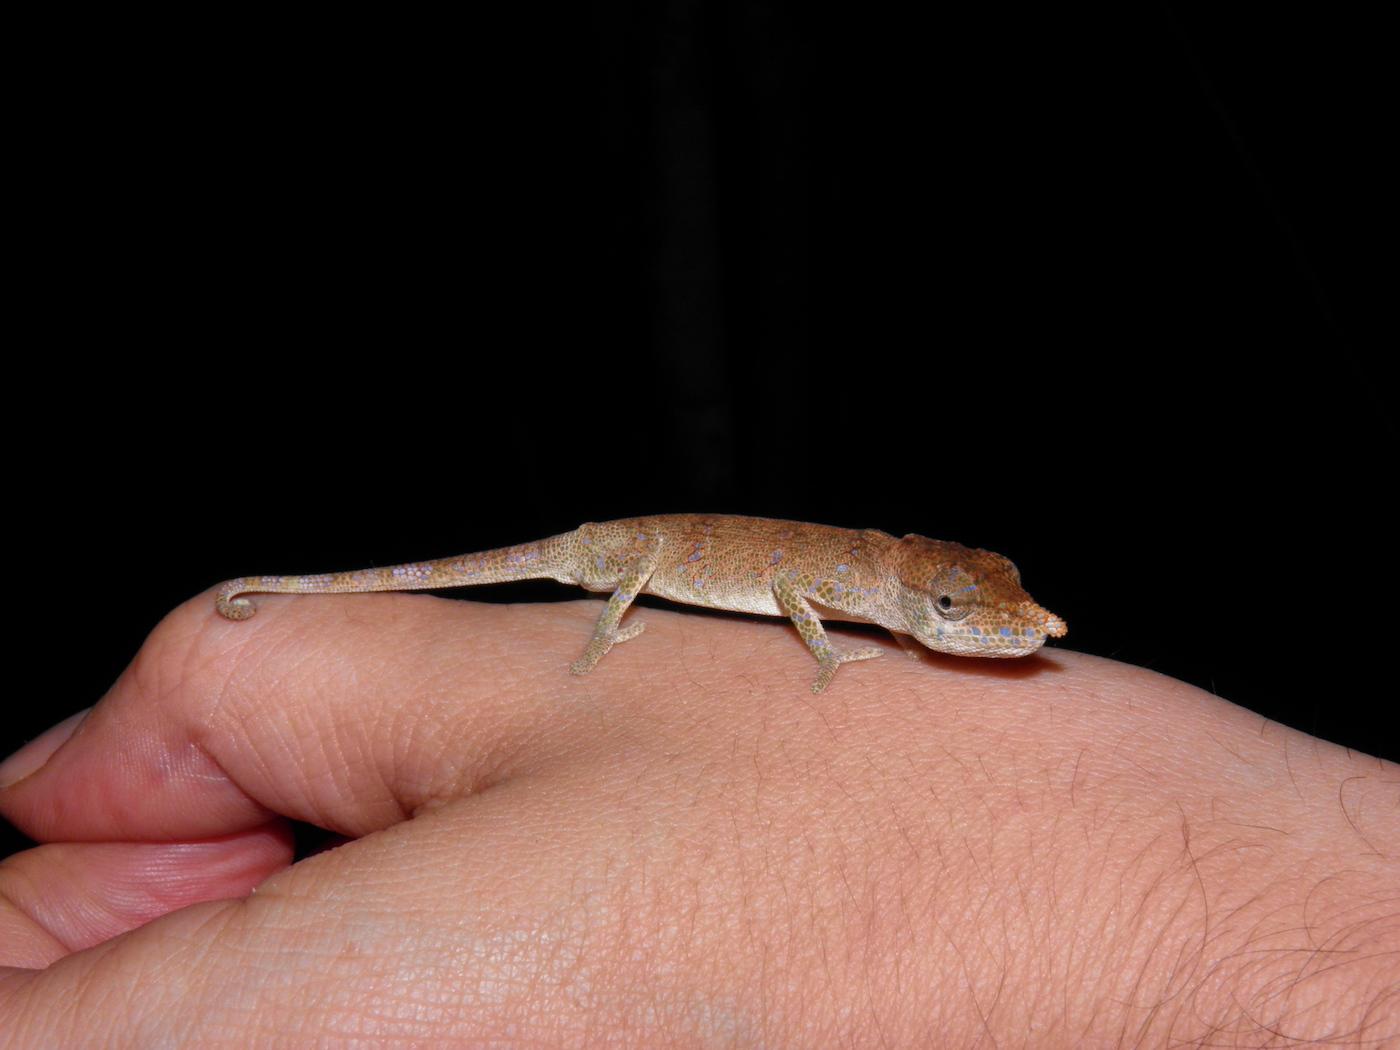 Un camaloente - foto R. Sawyer